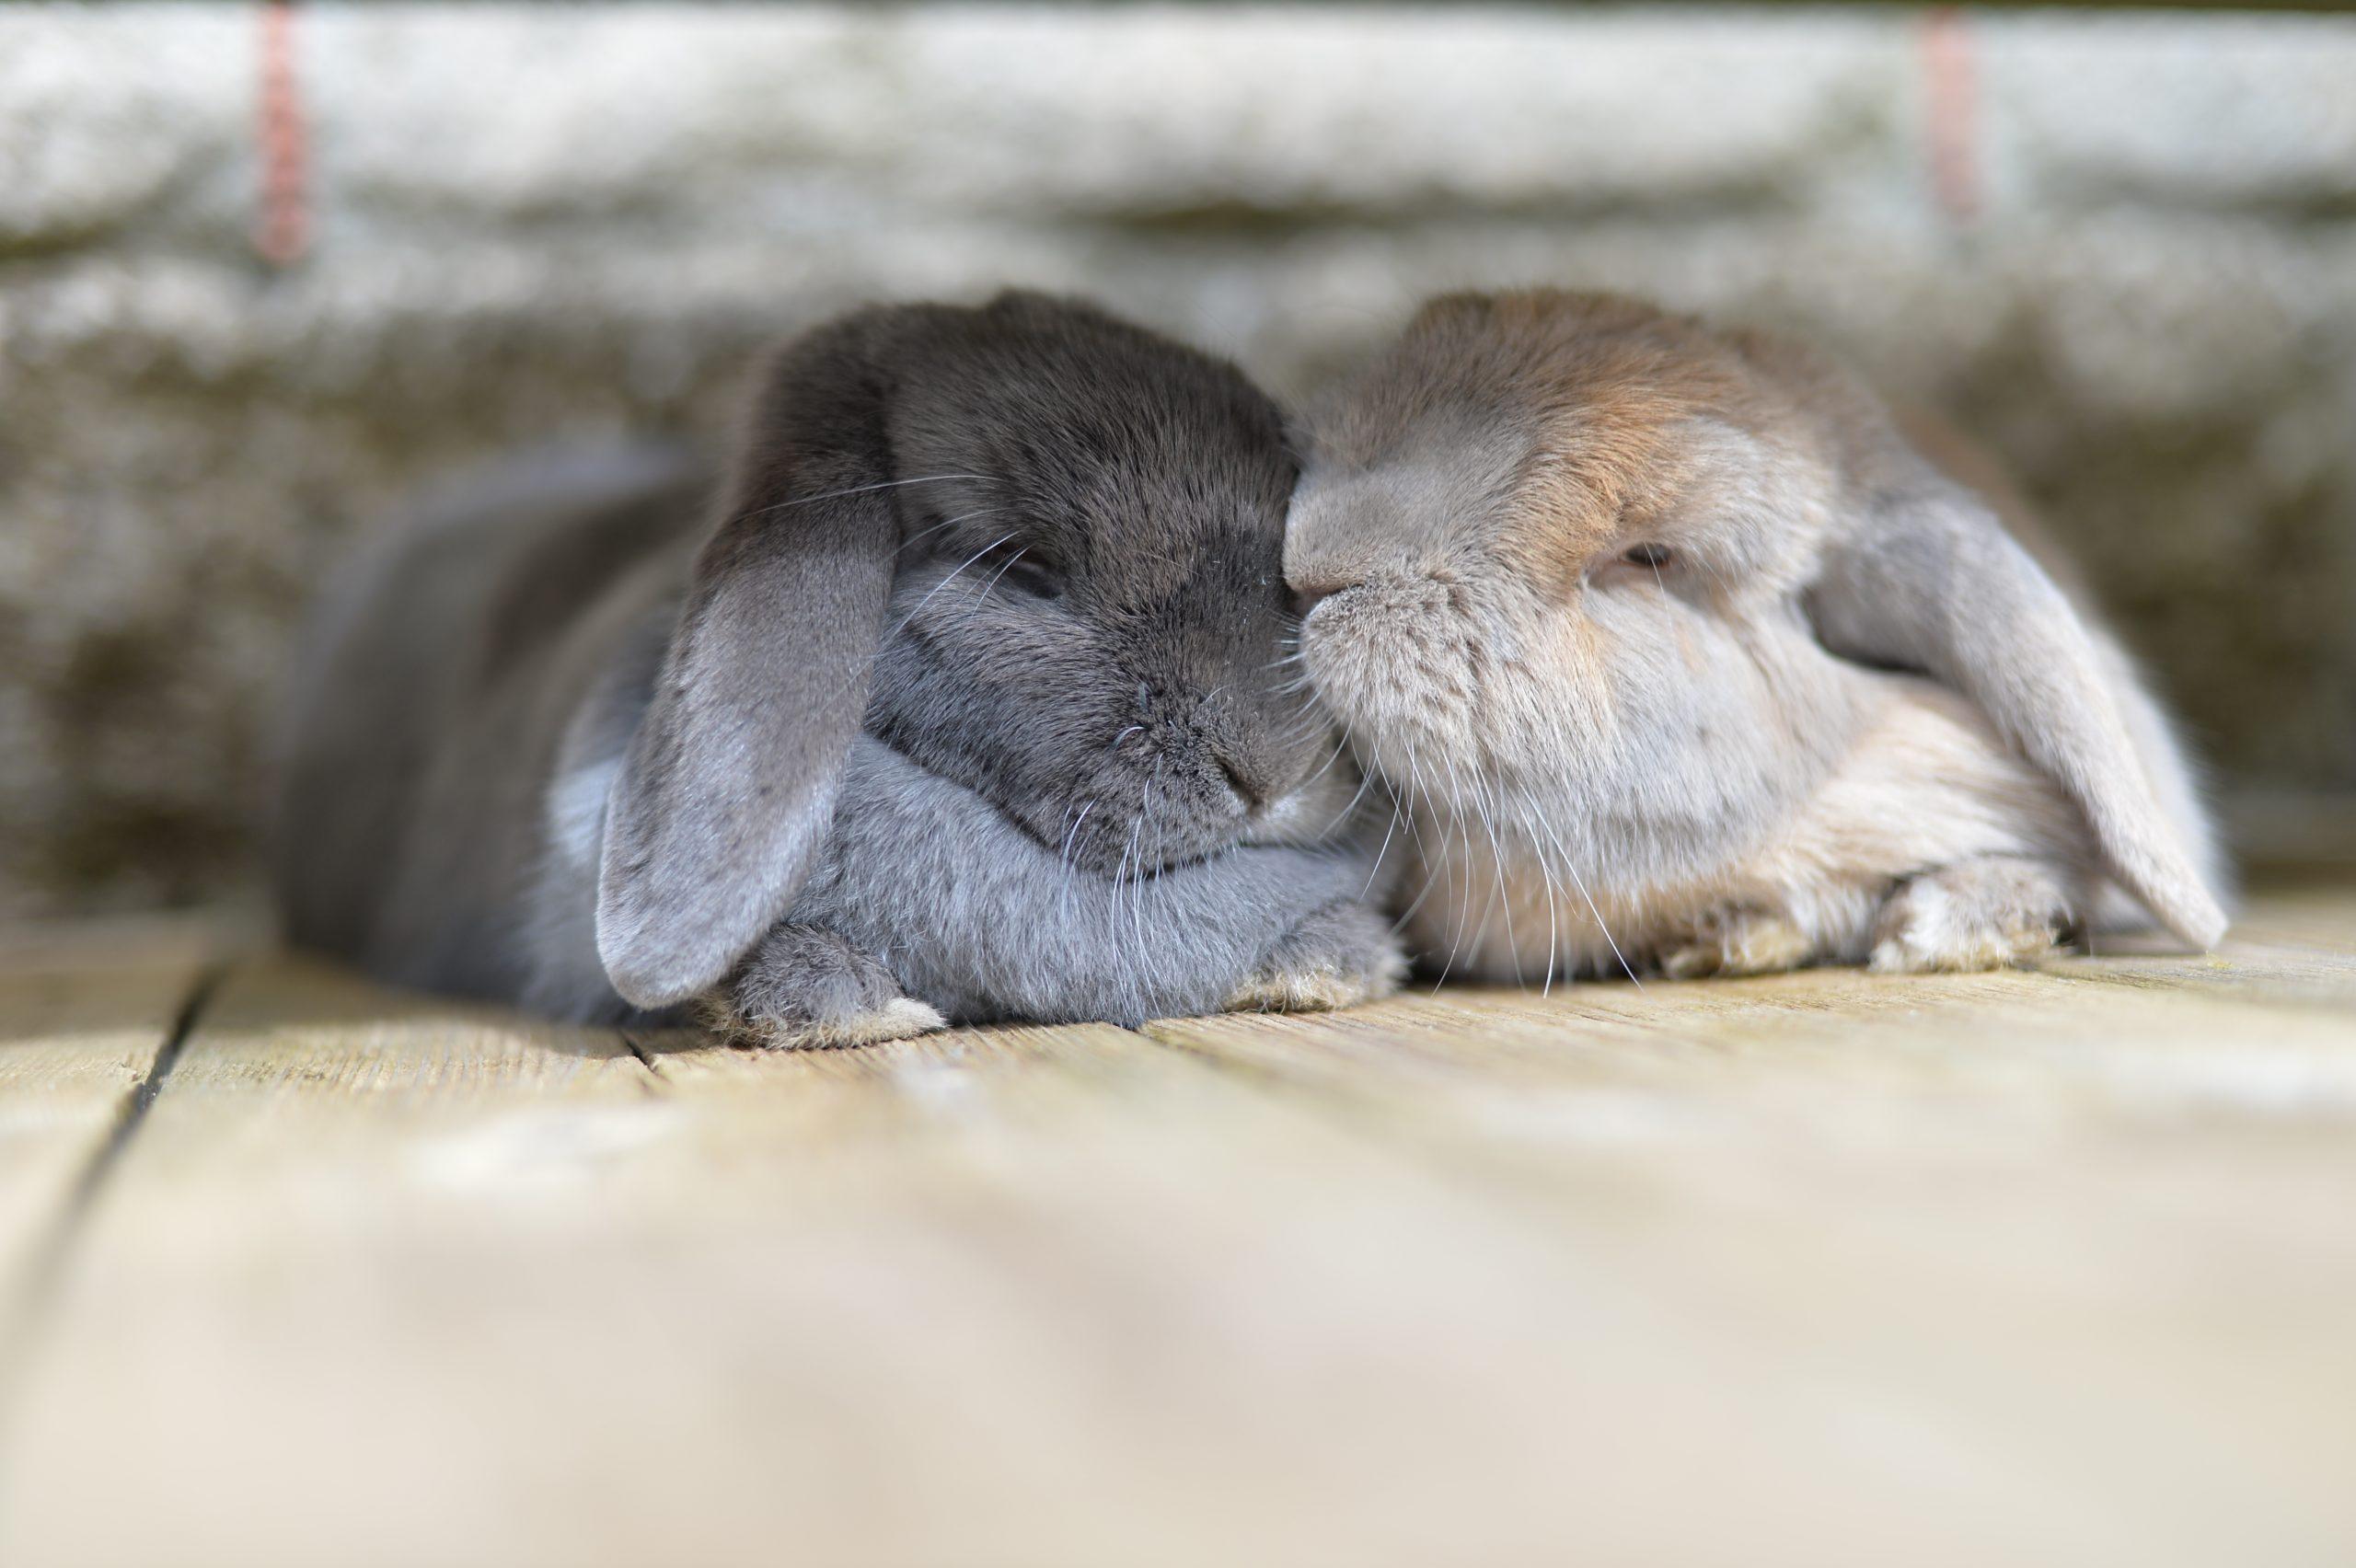 Two dwarf mini lop eared rabbits grooming